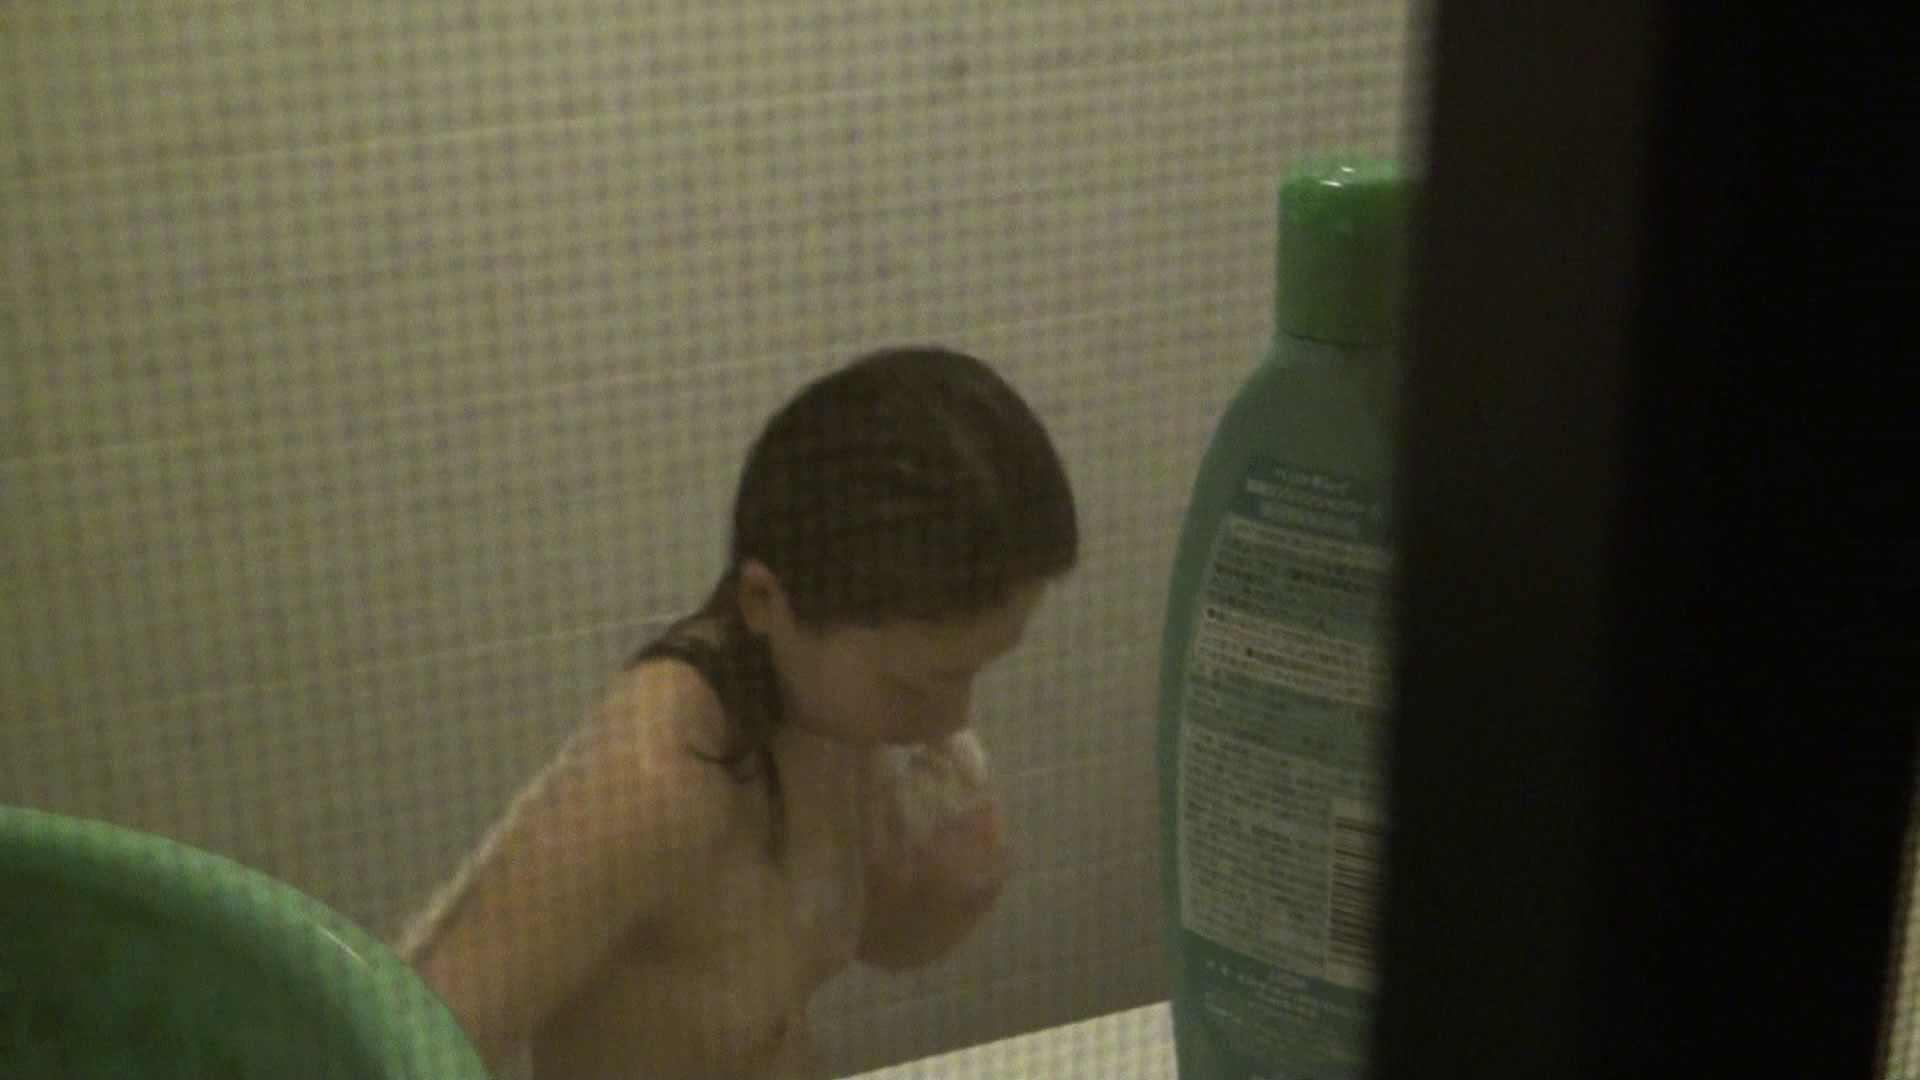 vol.06顔を洗い流す極上お女市さんの裸体をハイビジョンで!風呂上り着替え必見! 美乳 オマンコ動画キャプチャ 68画像 4